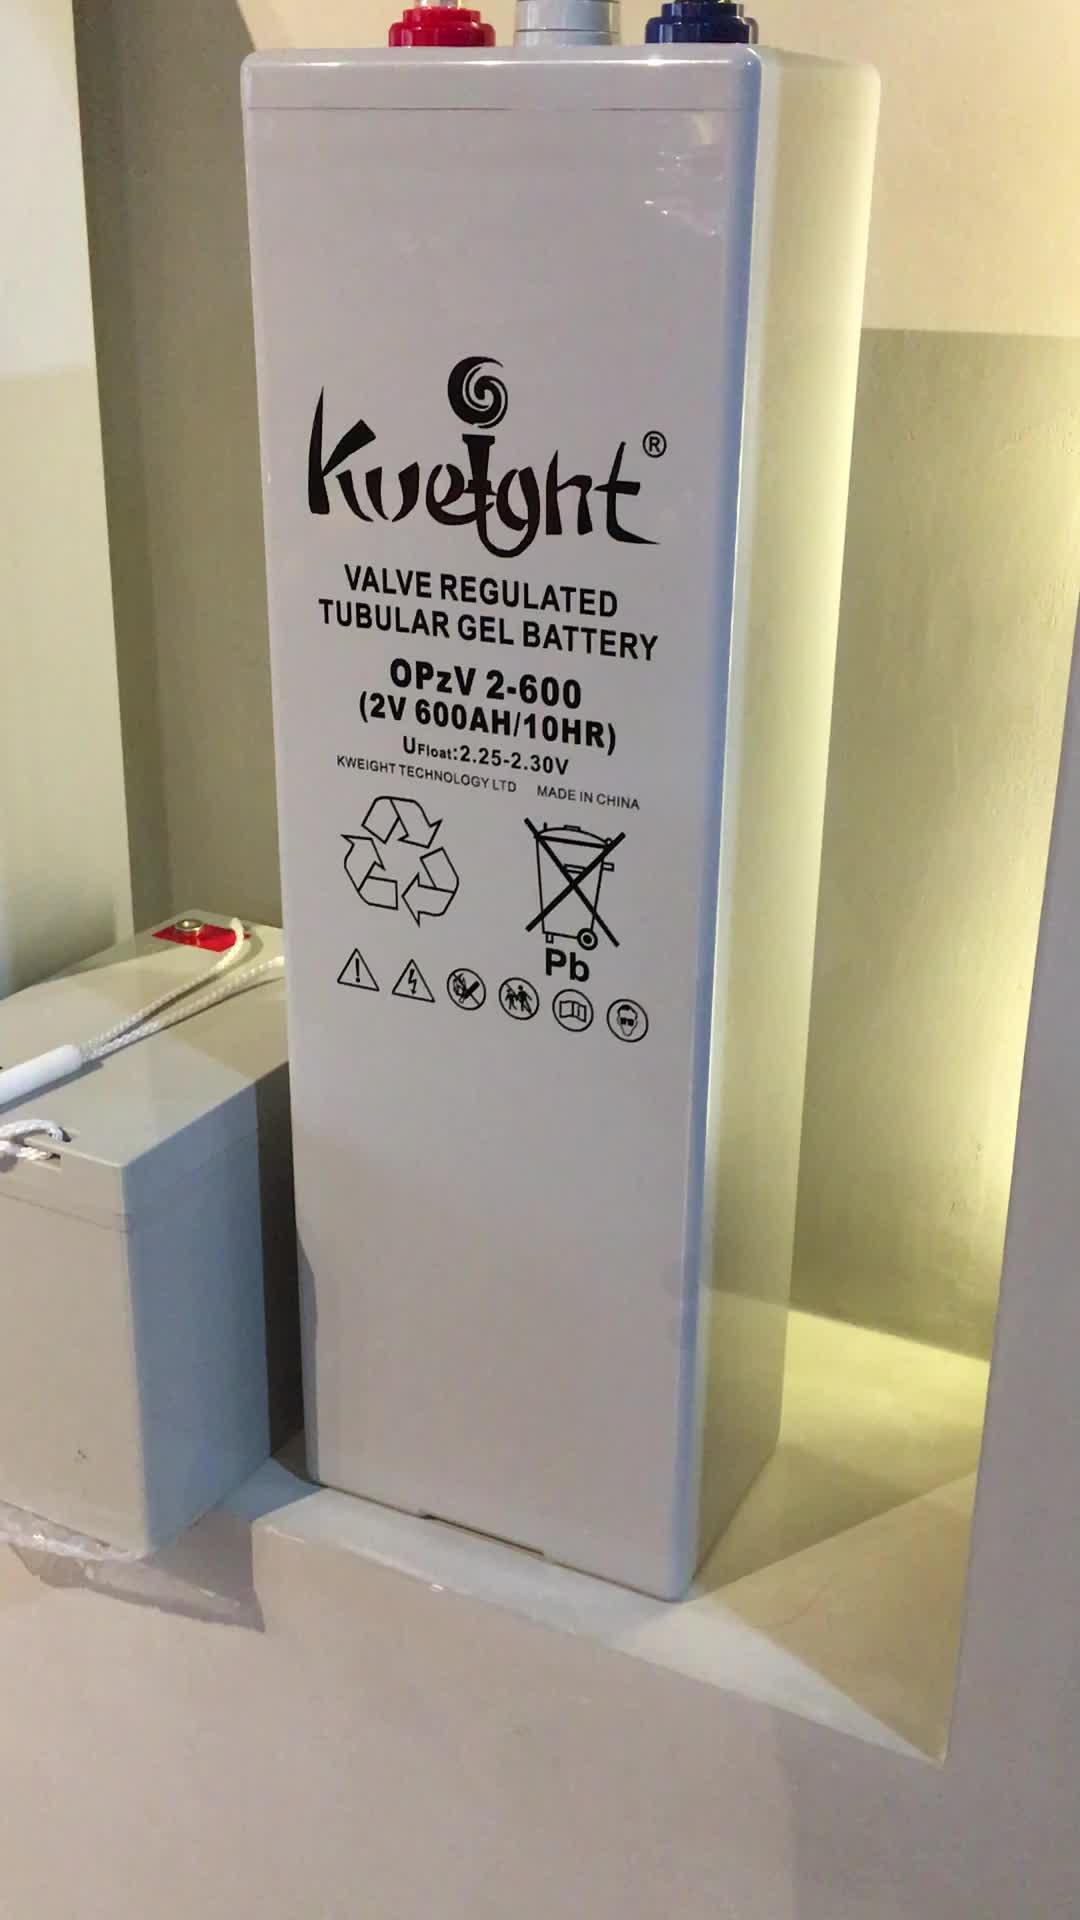 $Hot sale tubular gel battery 2v 12v 24v 48v 600ah OPzV storage+batteries Canton fari